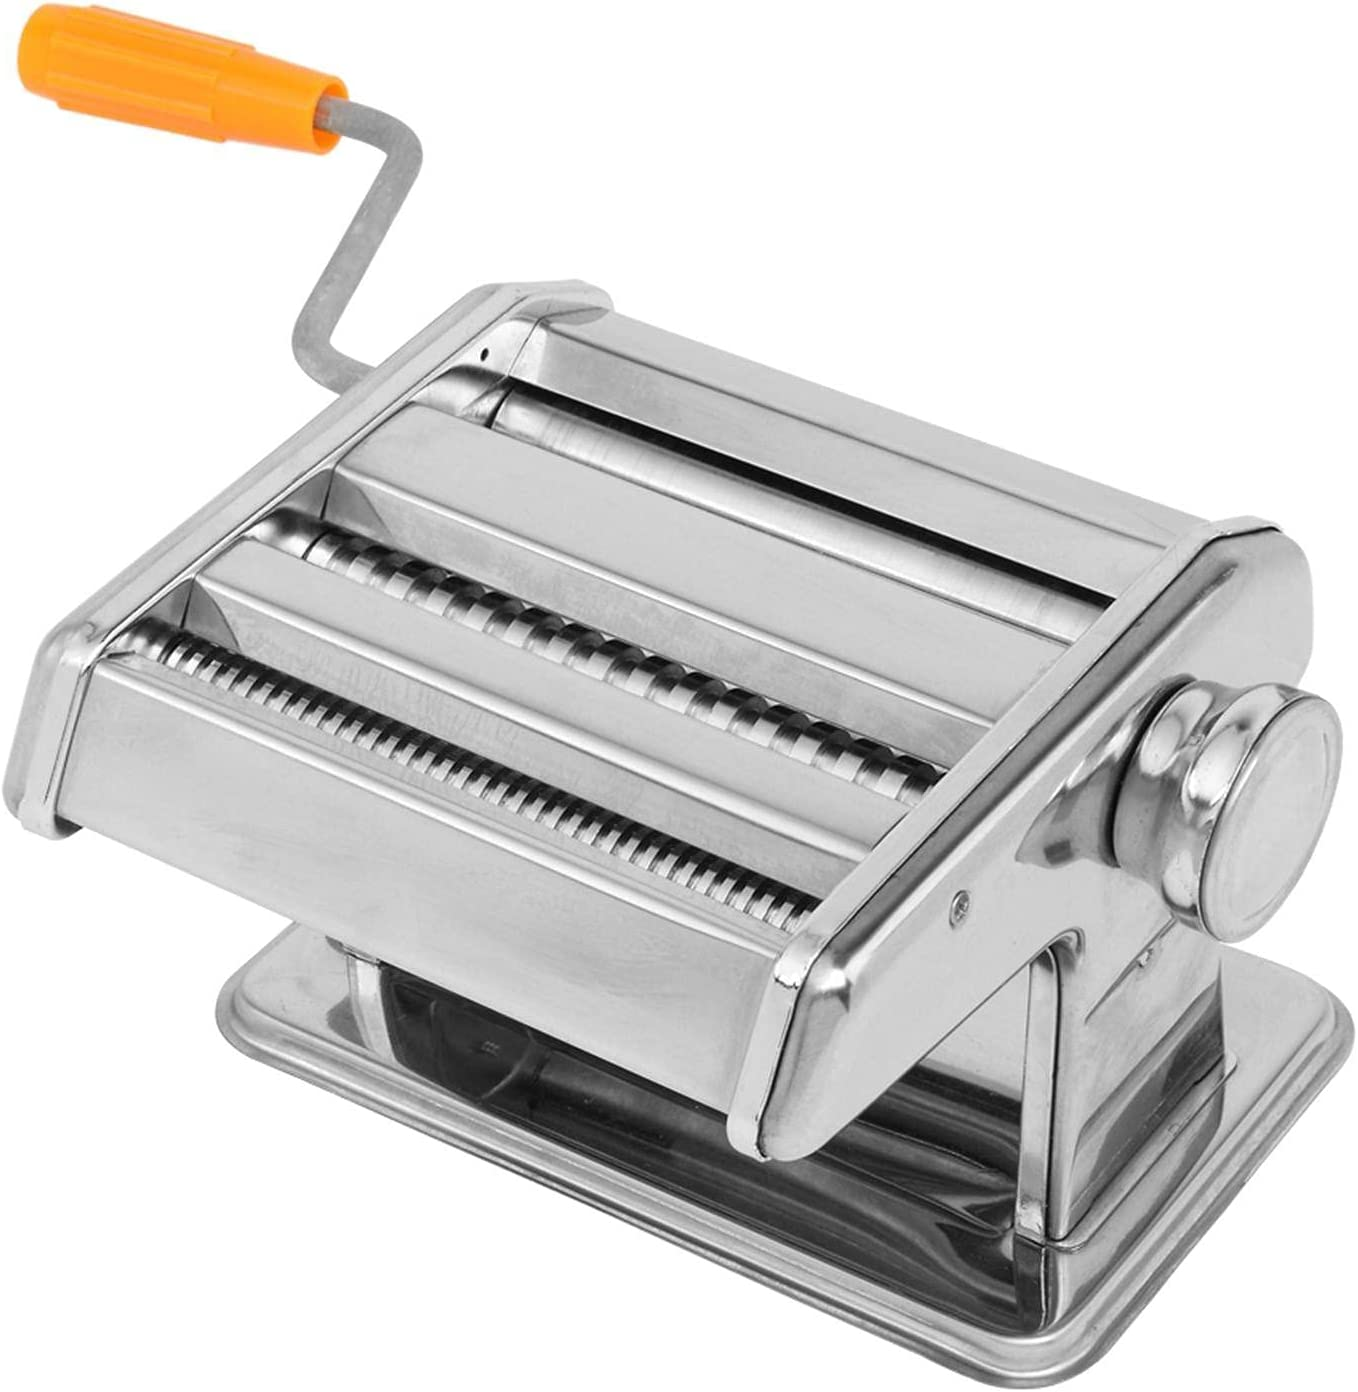 N\C Fashionable Stainless Steel Manual Maker Press Noodle Multi-Funct Nippon regular agency